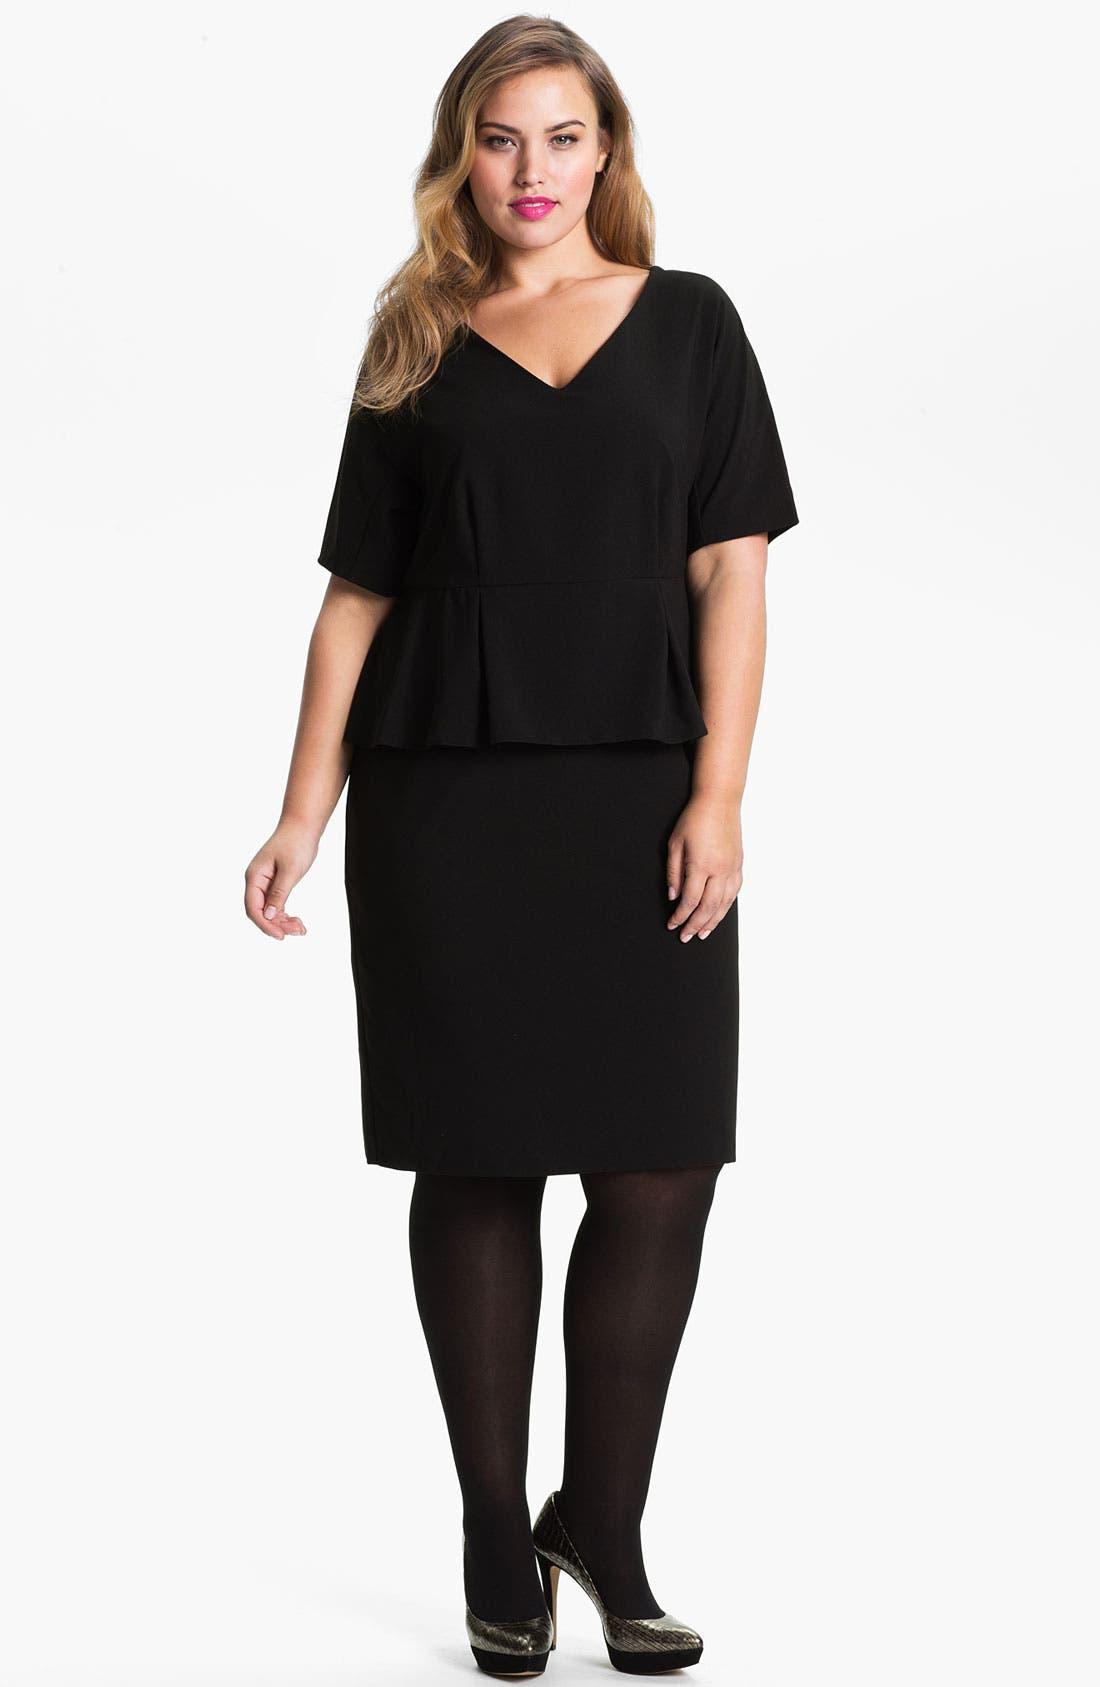 Alternate Image 1 Selected - Evans 'Debra' Peplum Dress (Plus Size)